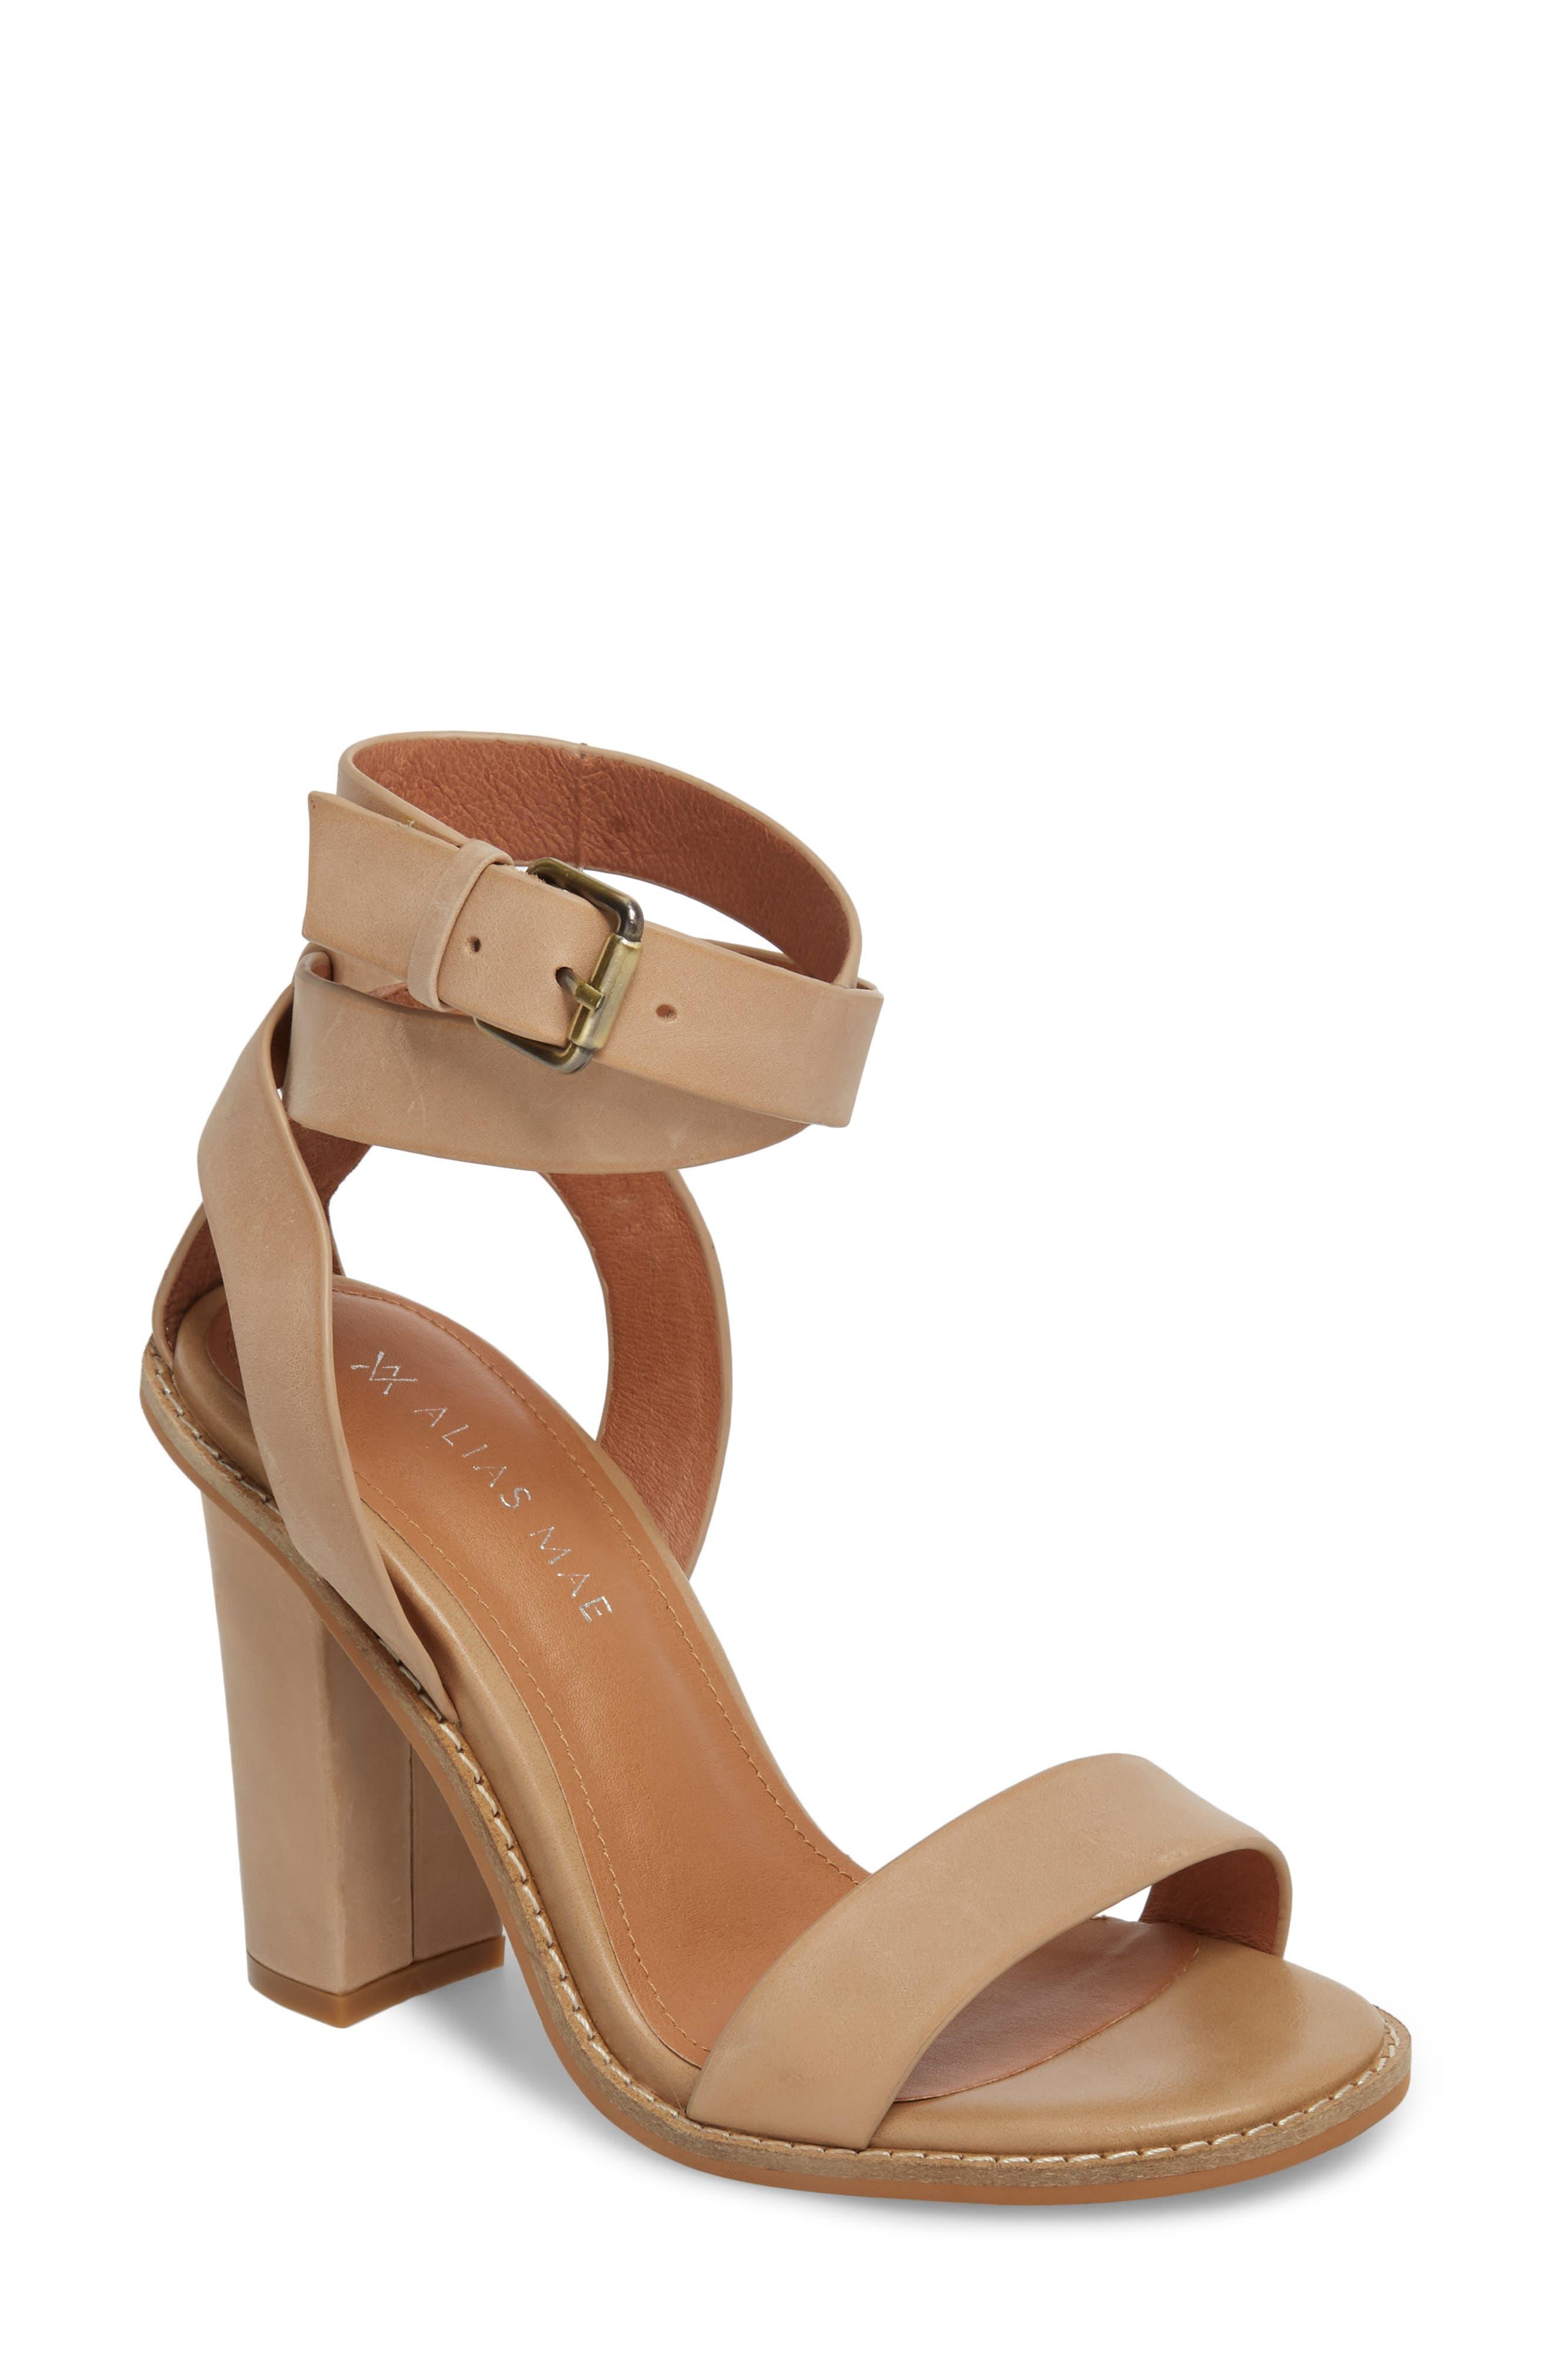 Calito Ankle Strap Sandal,                             Main thumbnail 2, color,